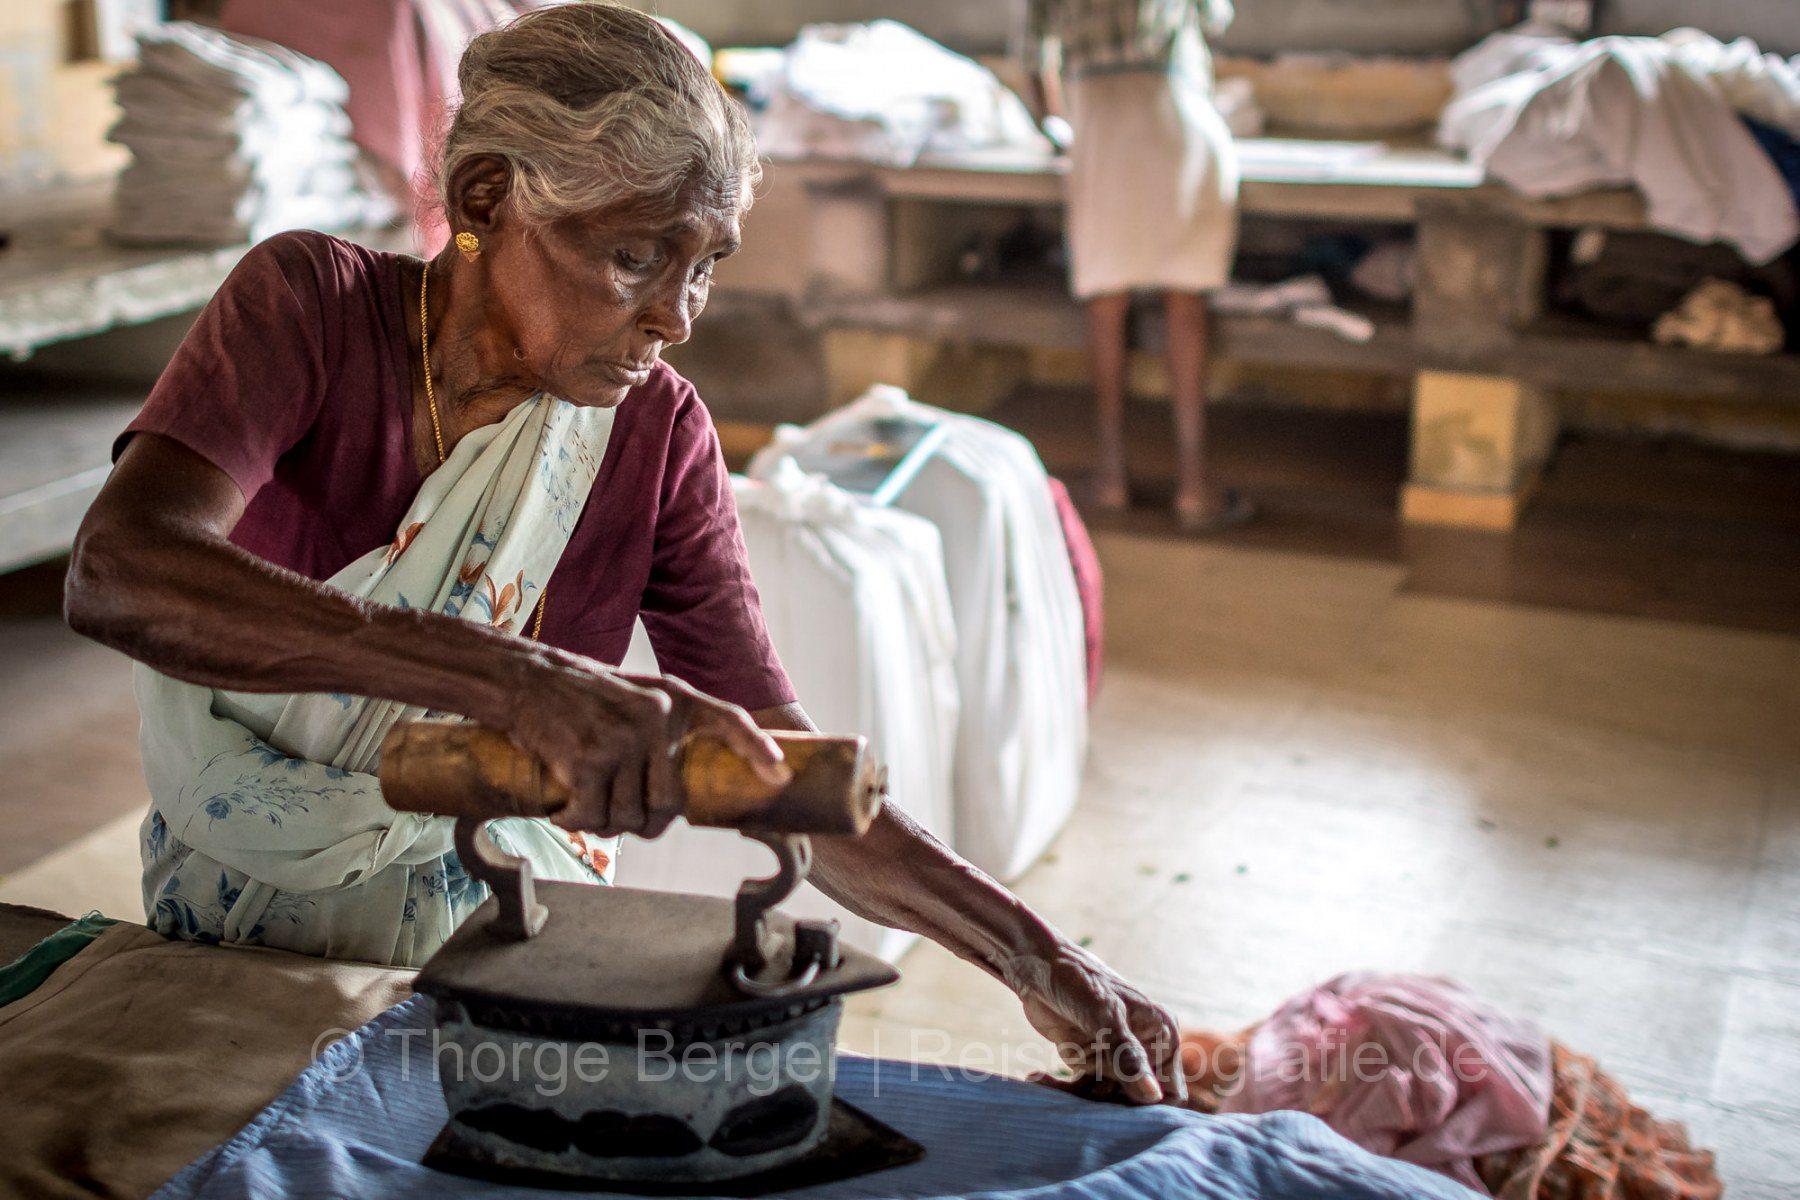 Laundry in Kochi